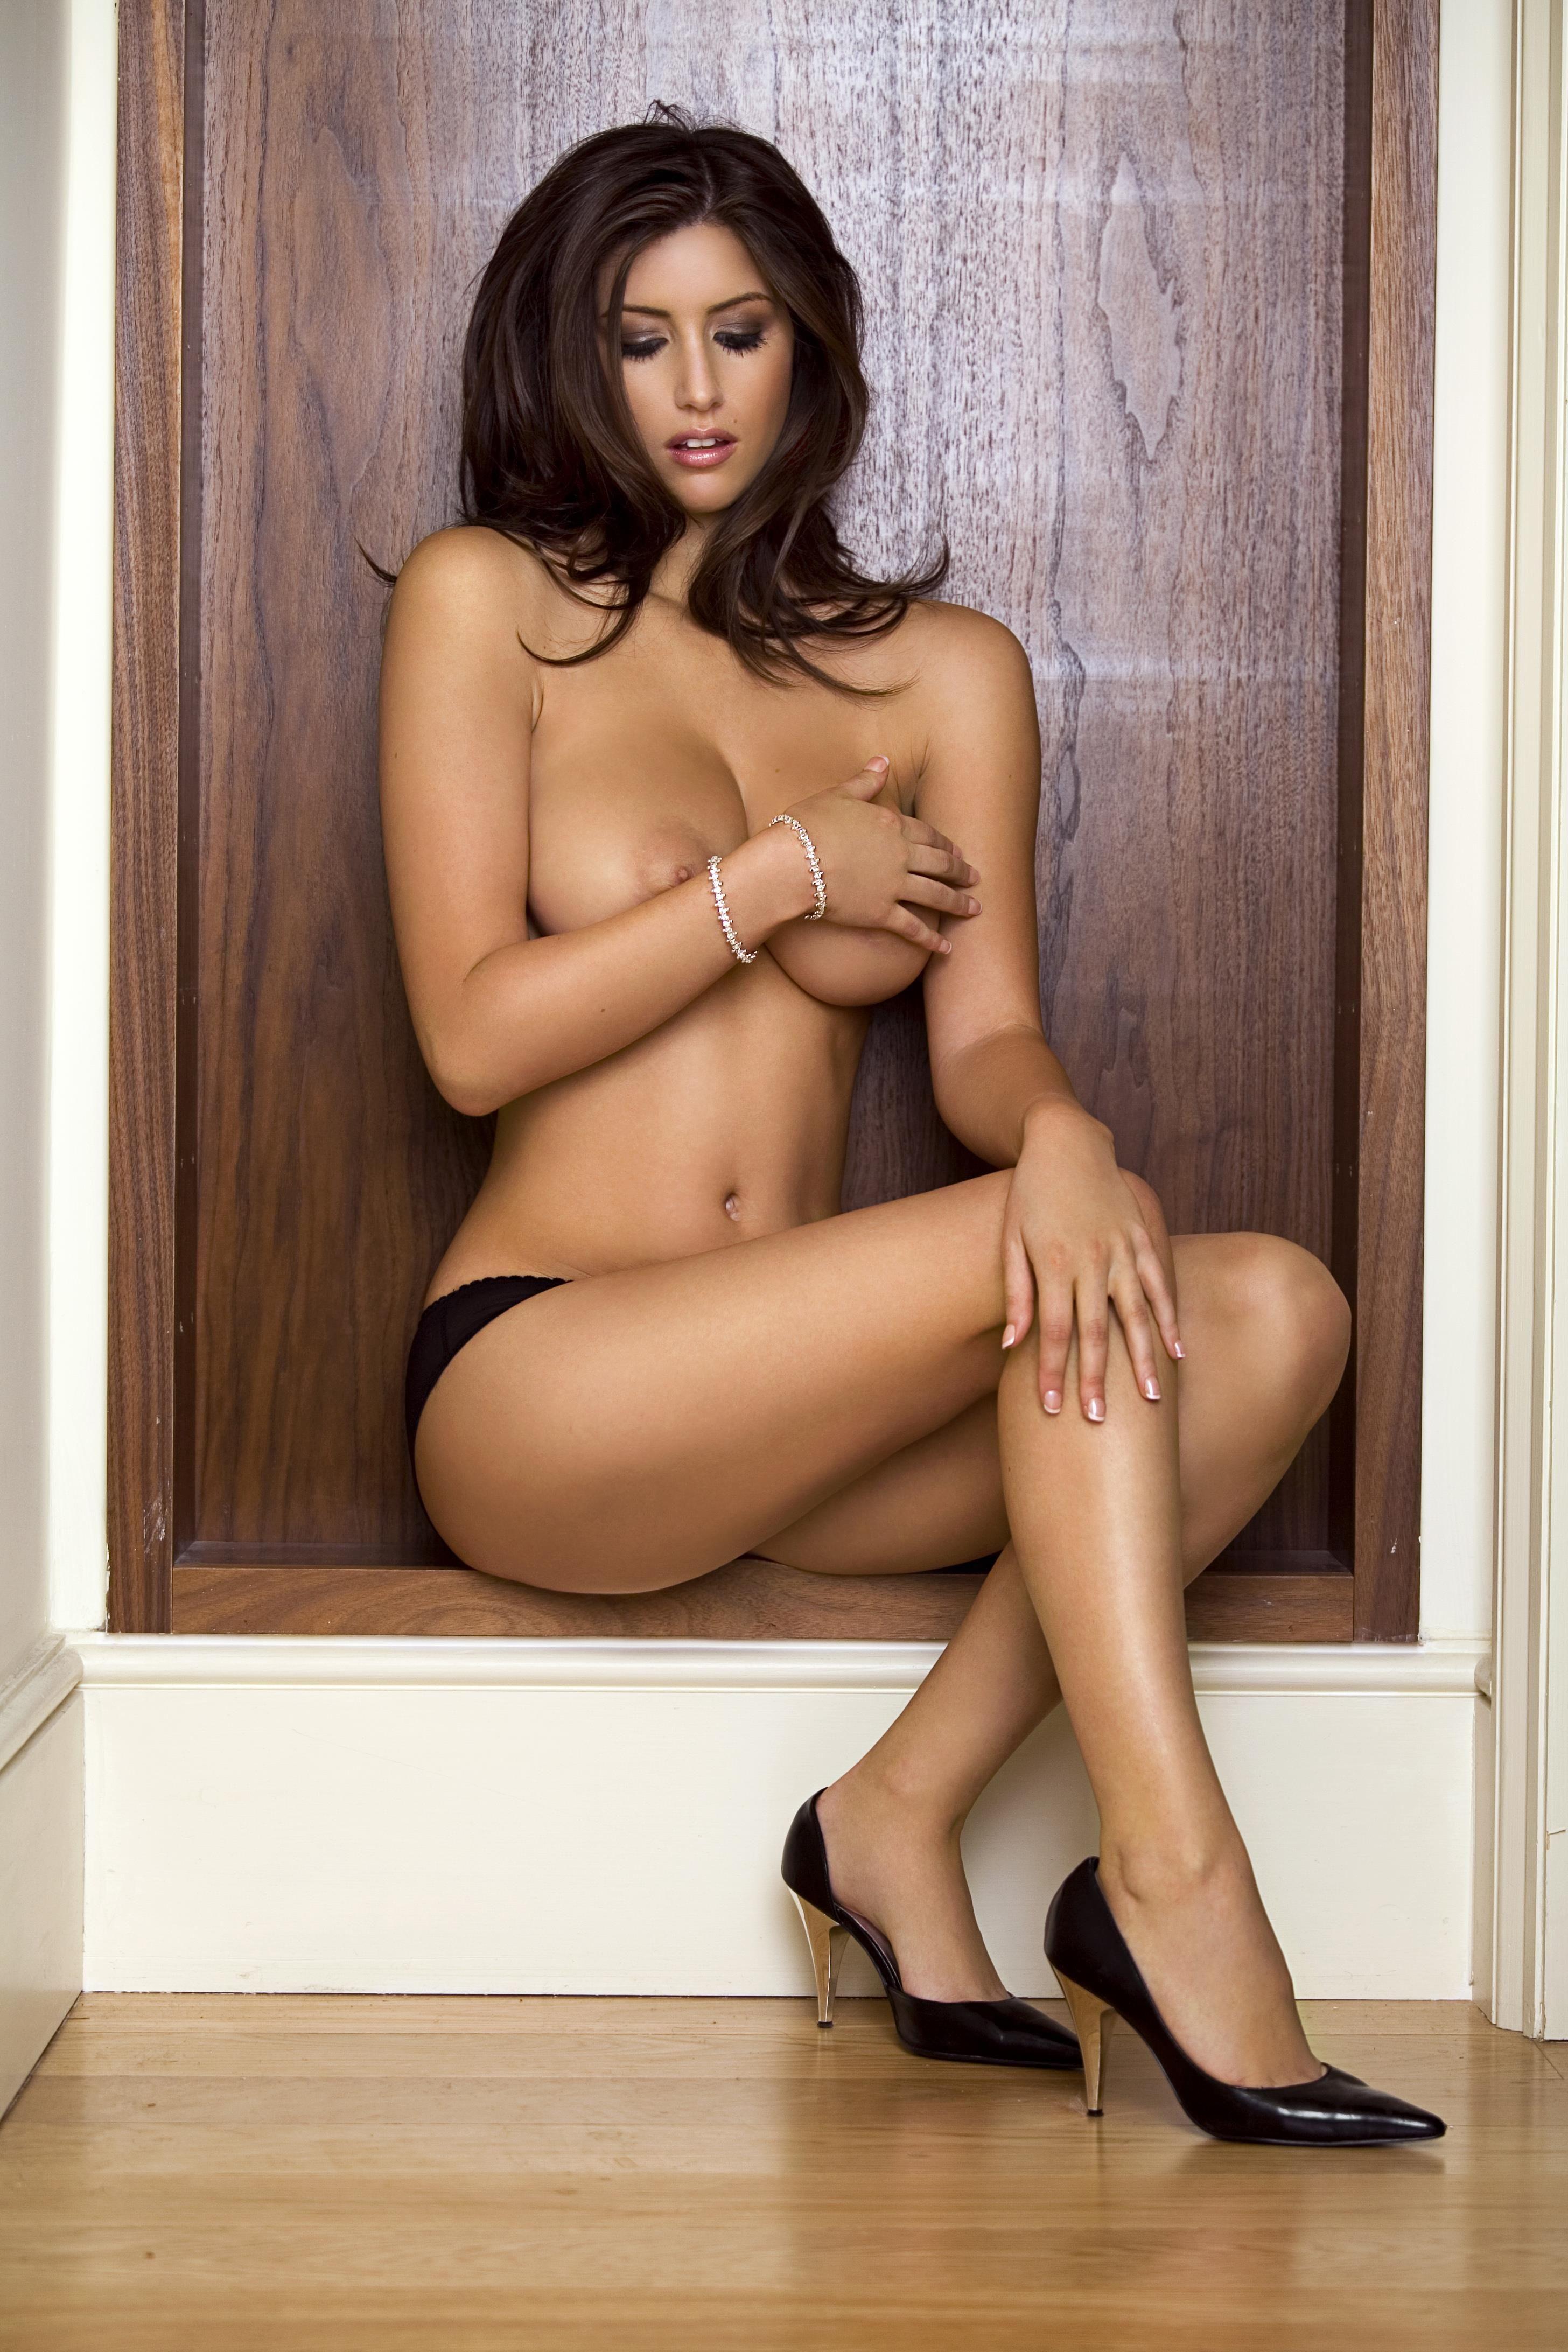 Jo Dee Messina Naked Simple katie marie cork nude pictures   best boobs   pinterest   cork